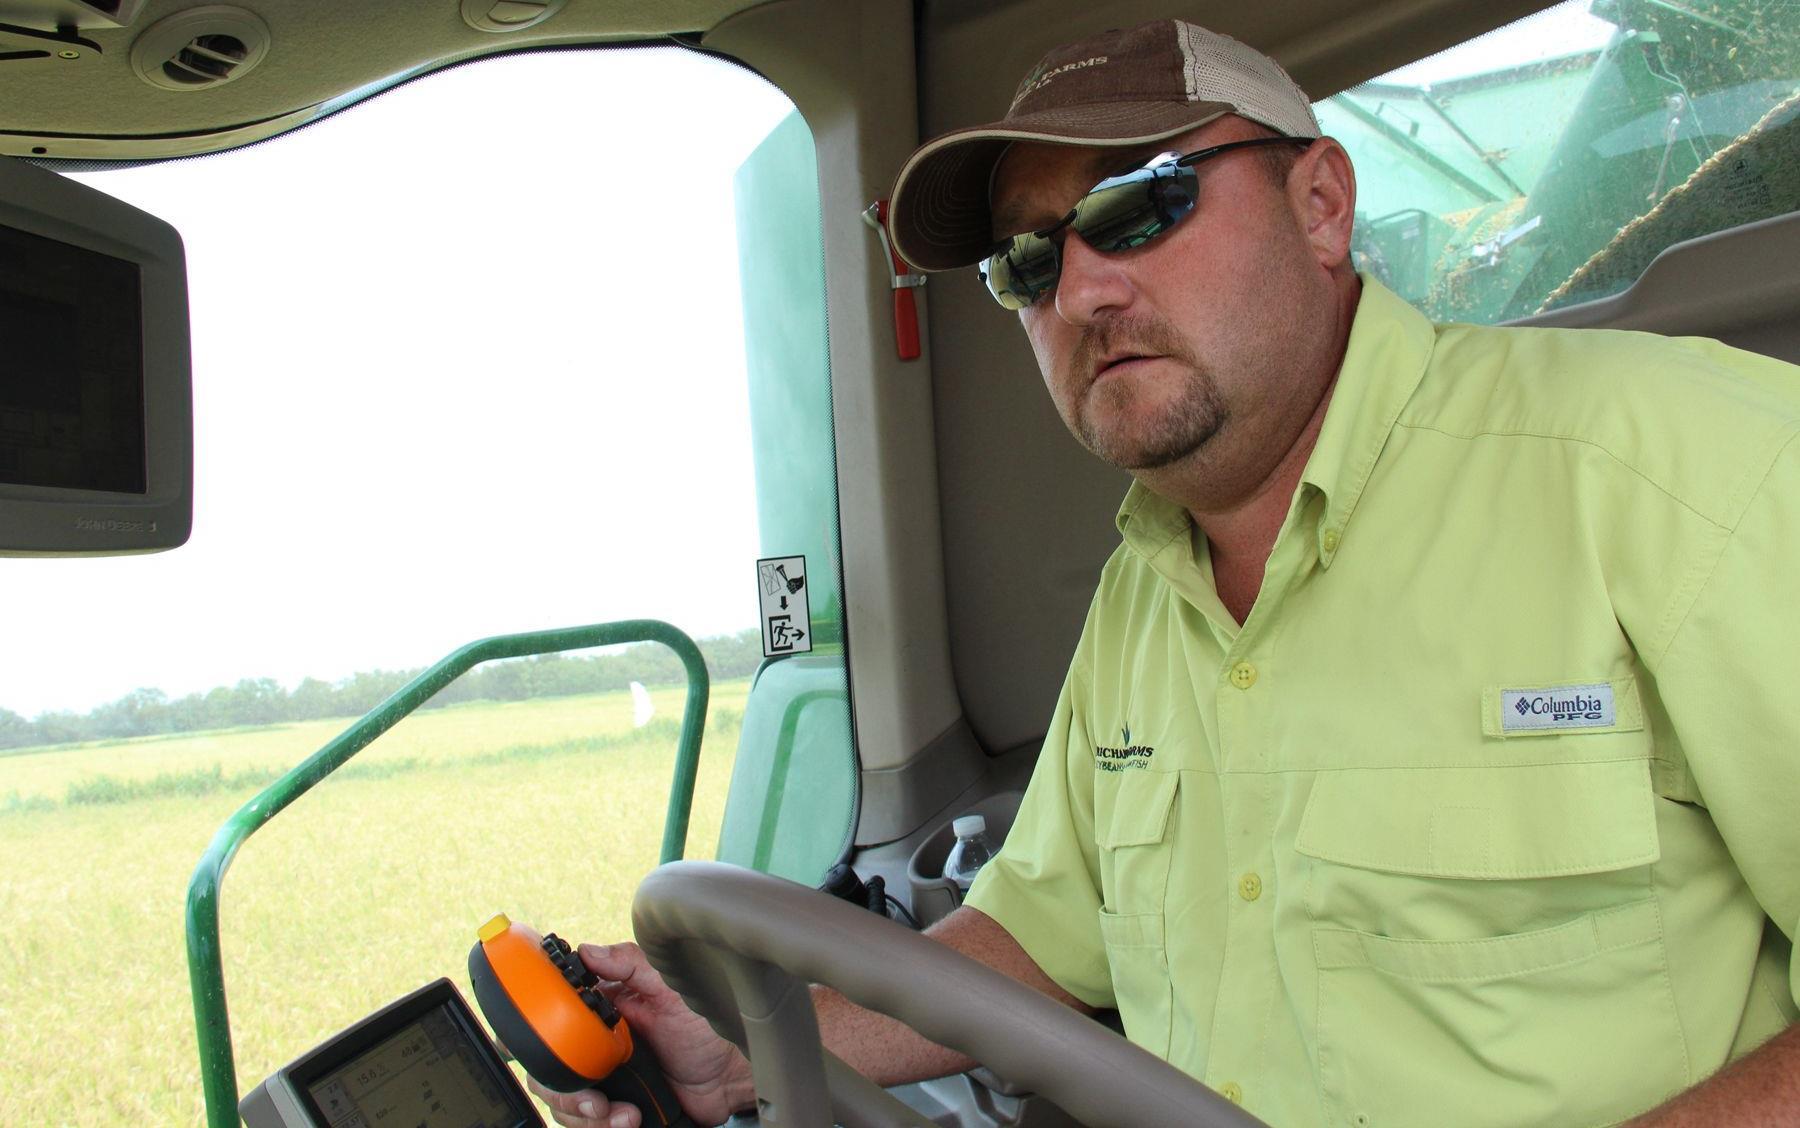 Man wearing yellow shirt and sunglasses drives green combine